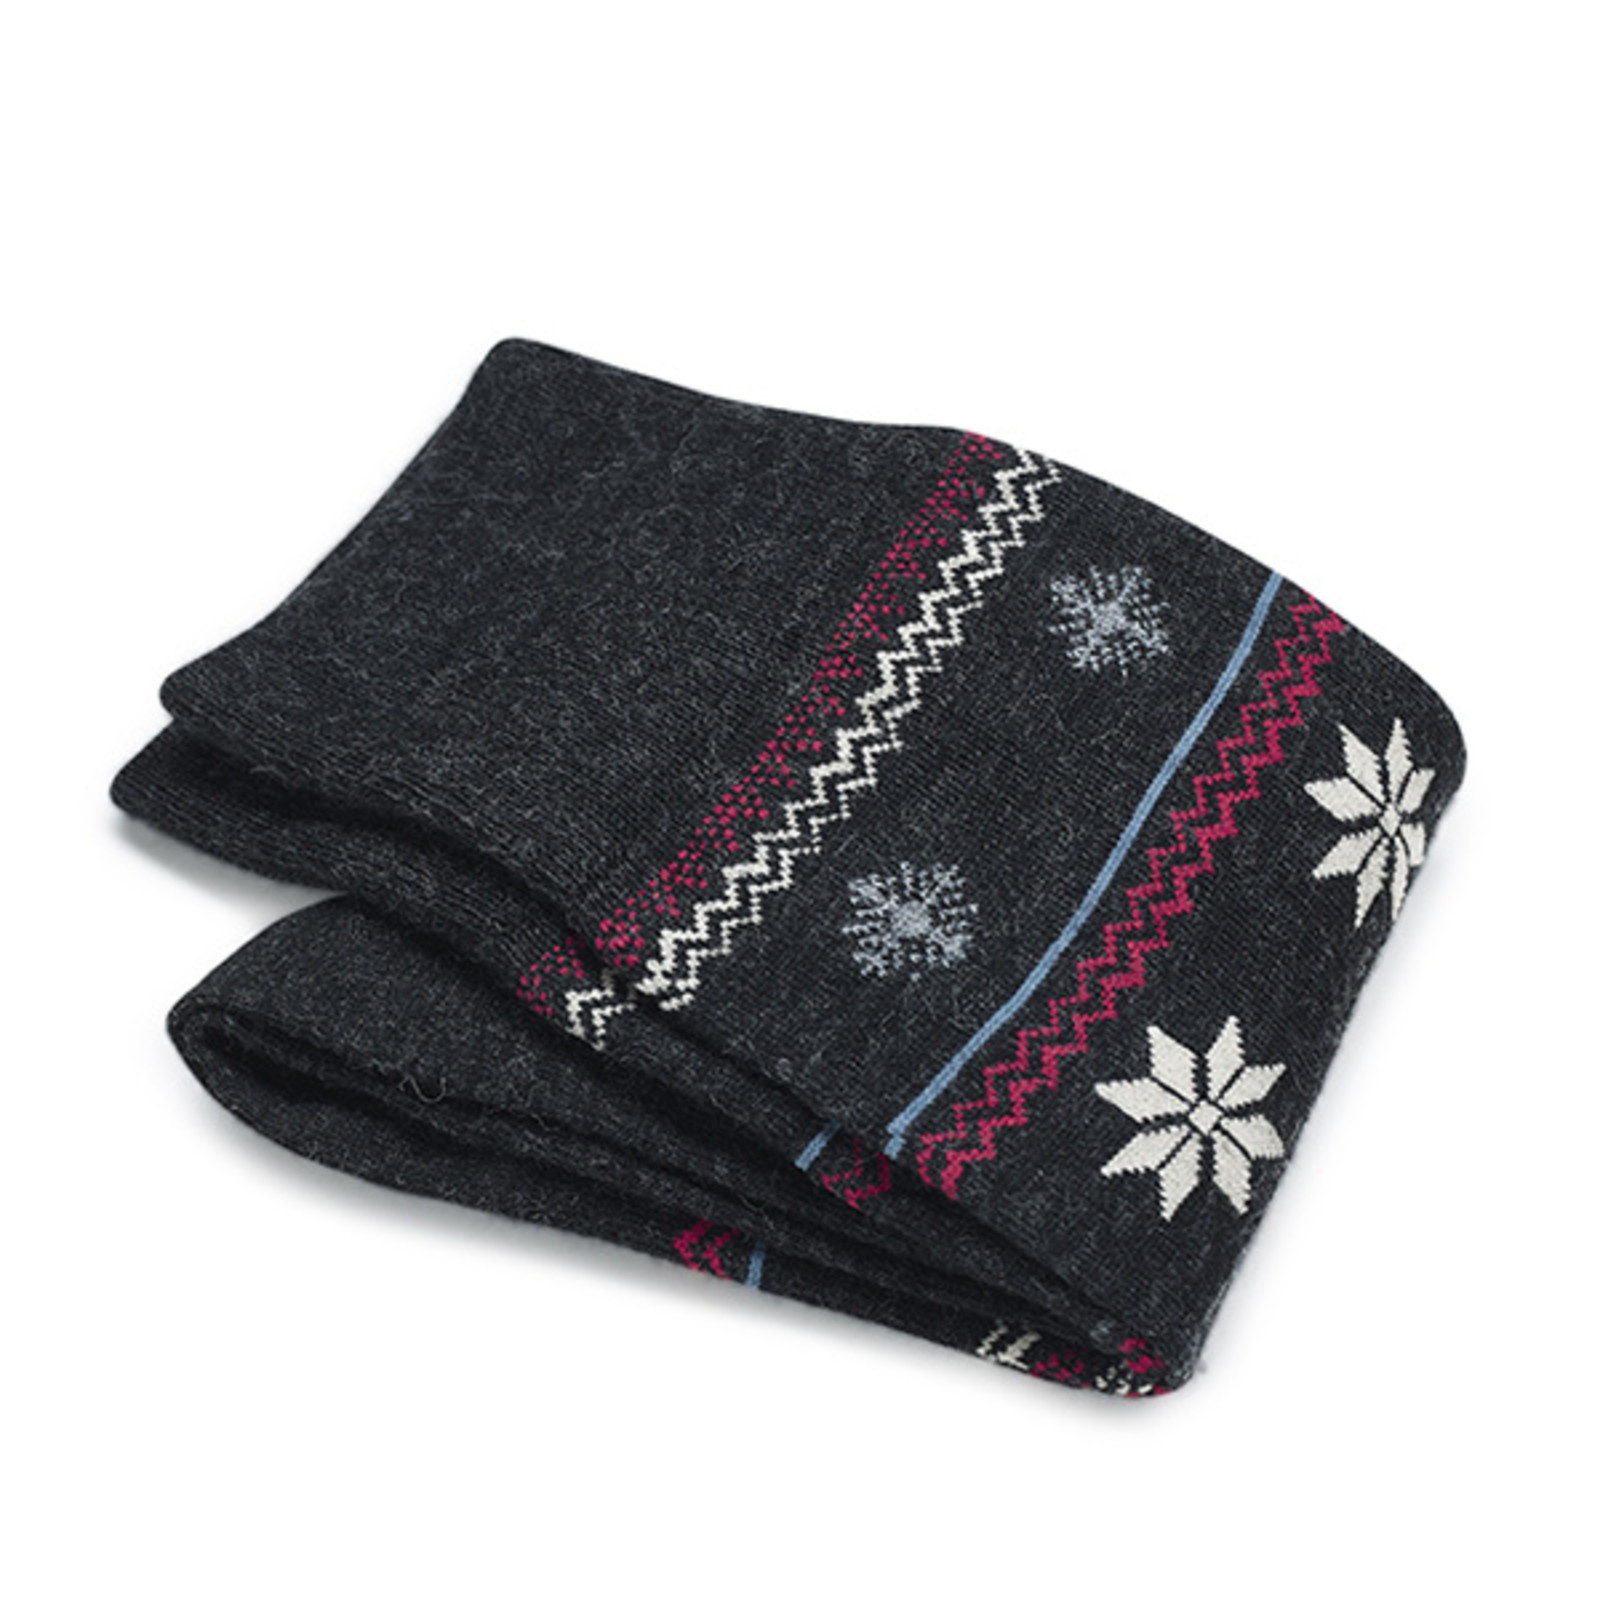 Carlo Lanza Graue Winter Socken | Carlo Lanza